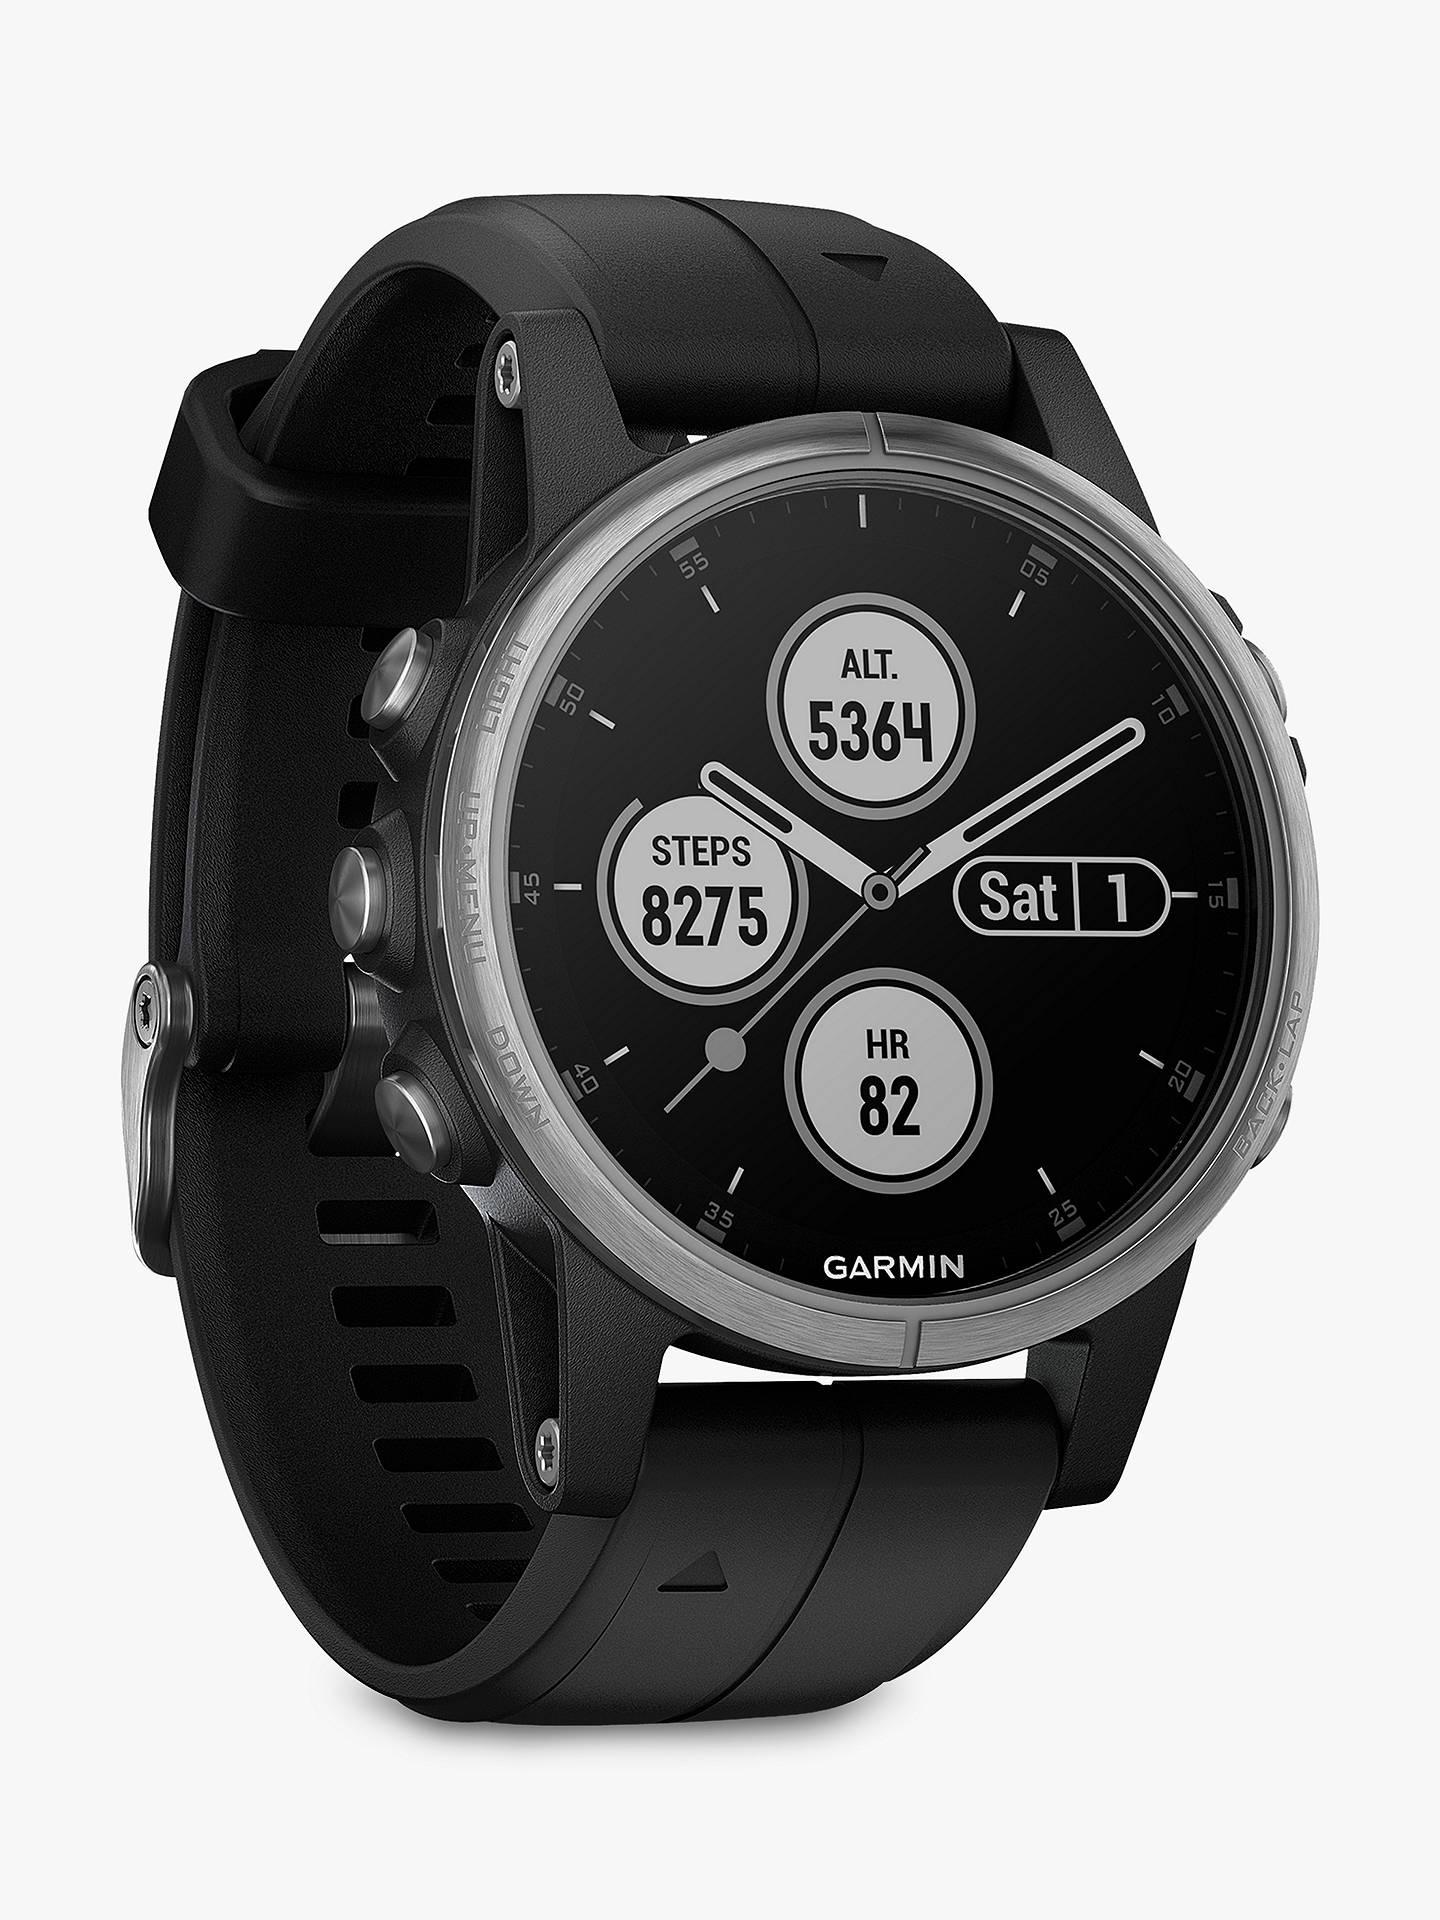 Garmin fēnix 5S Plus GPS Multisport Watch, Silver with Black Band, 4.2cm